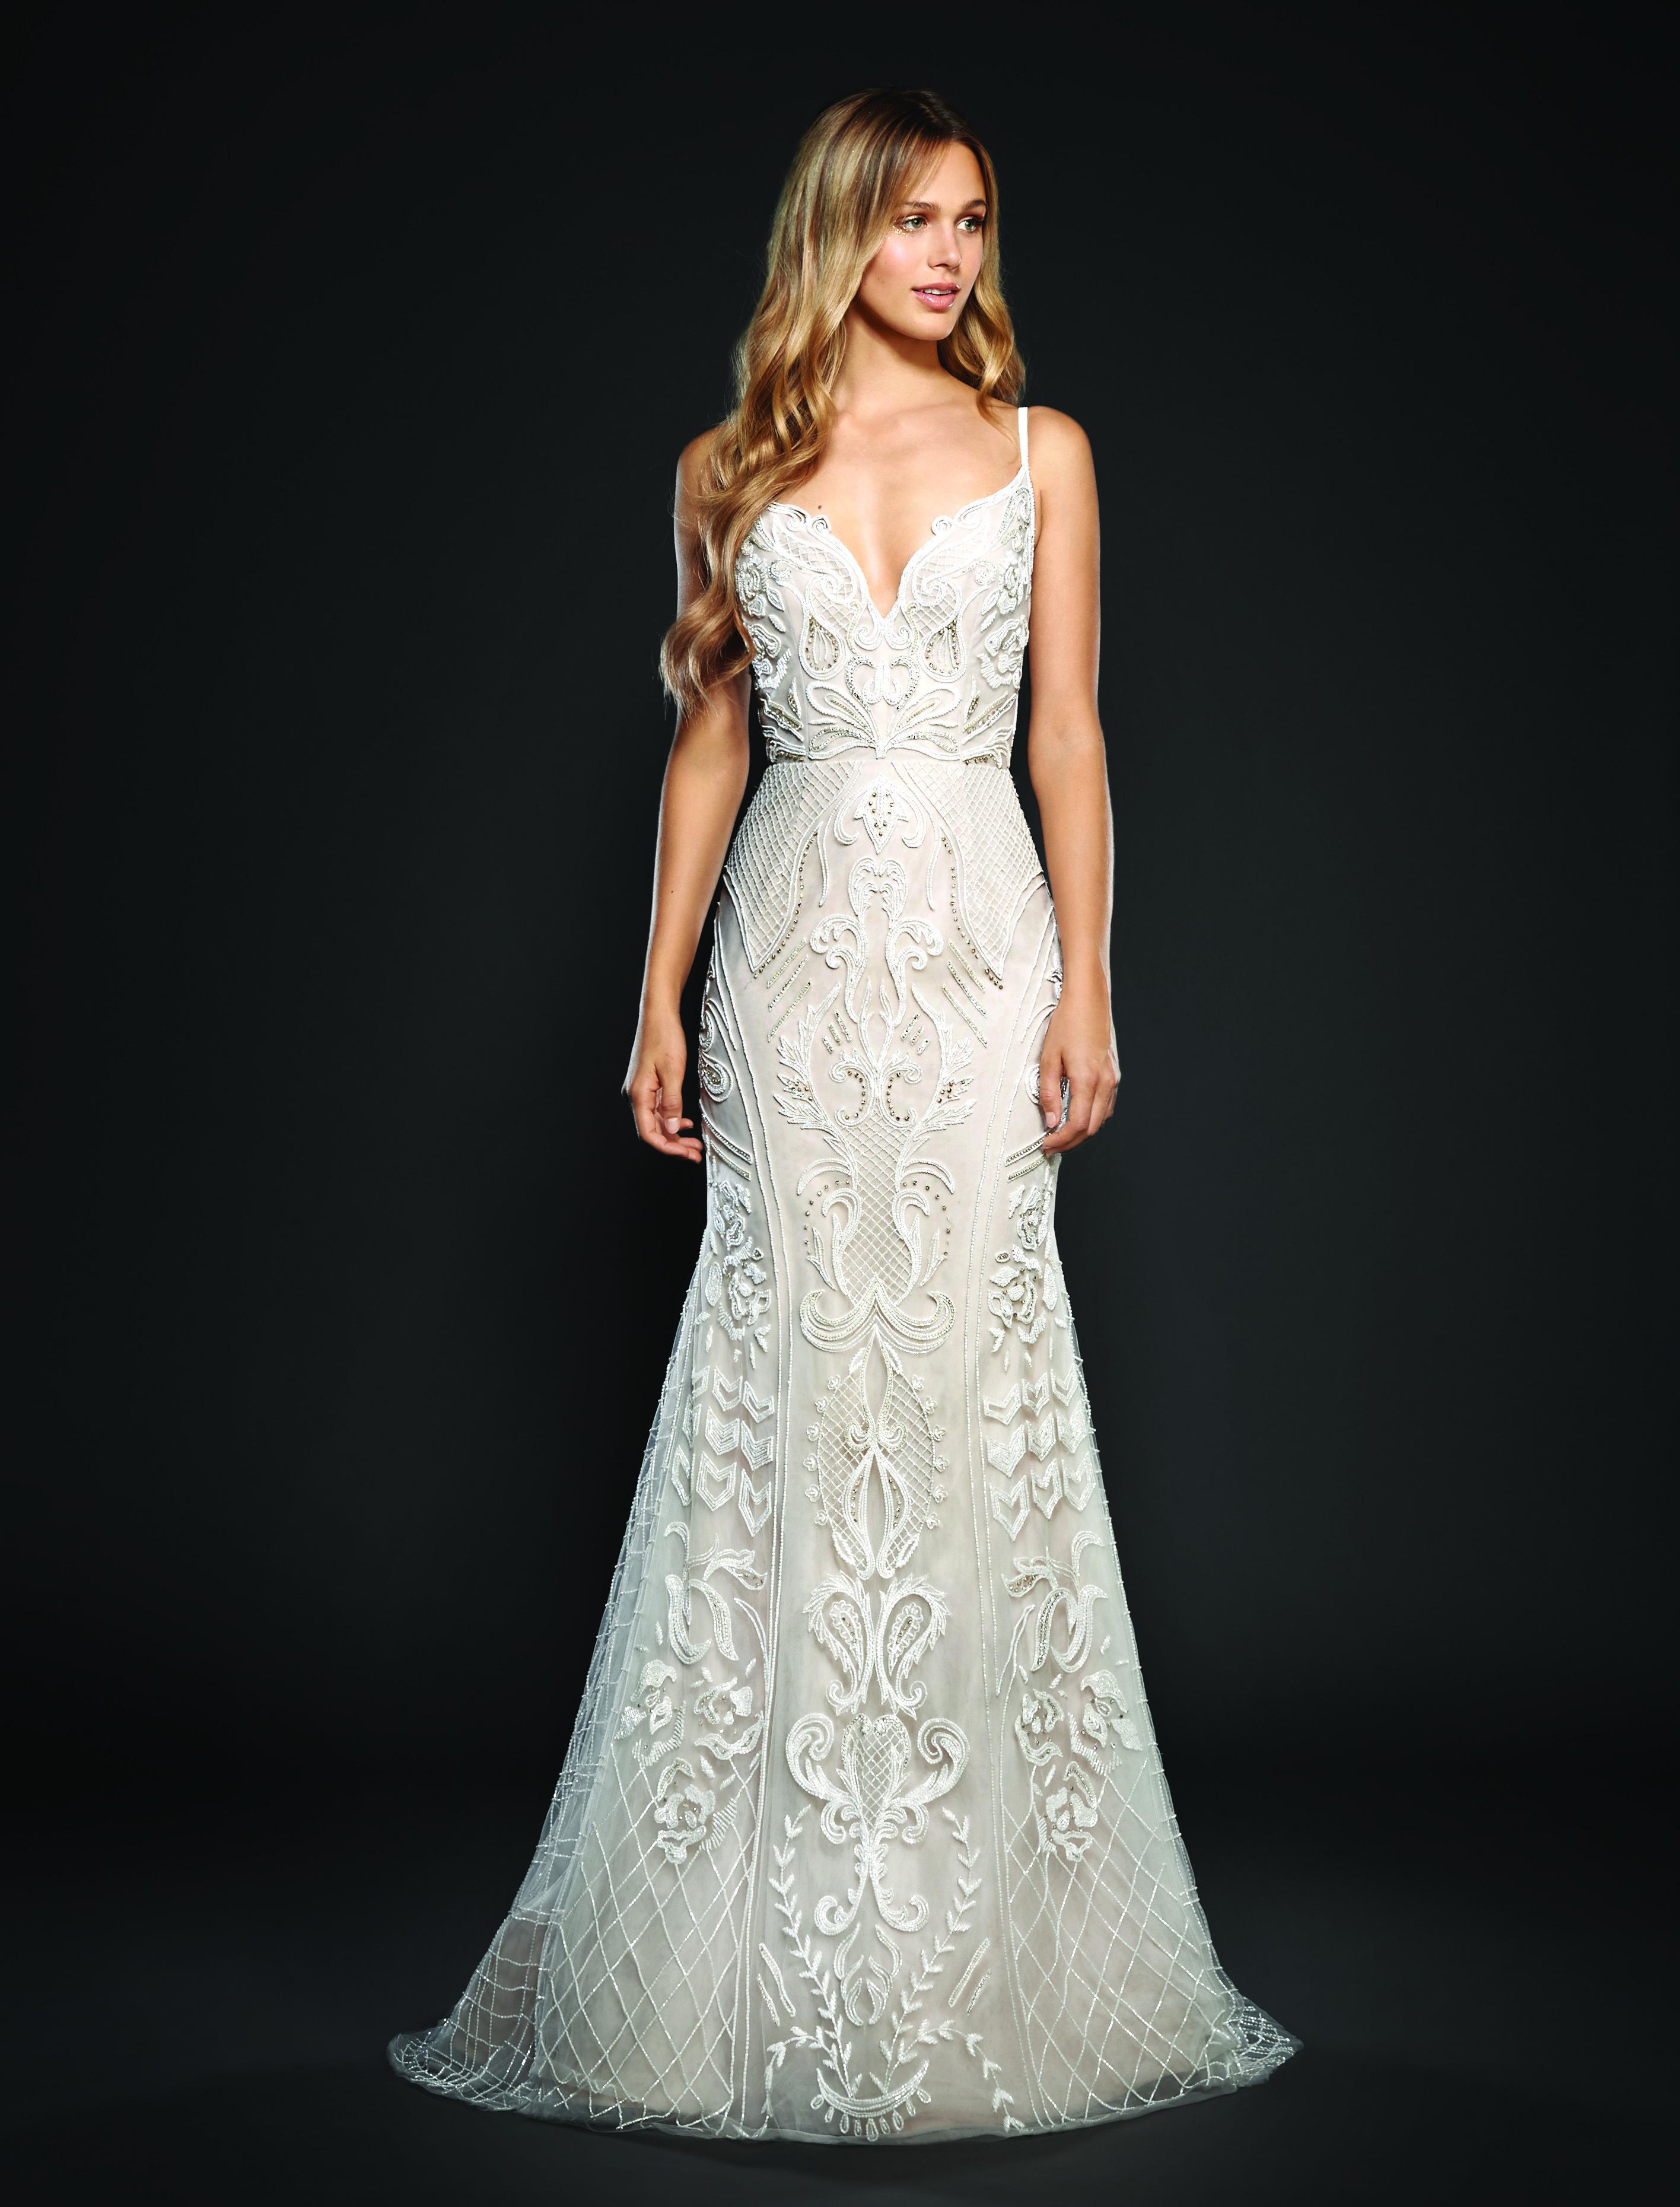 Trendy Sheath Wedding Dress | Kleinfeld Bridal